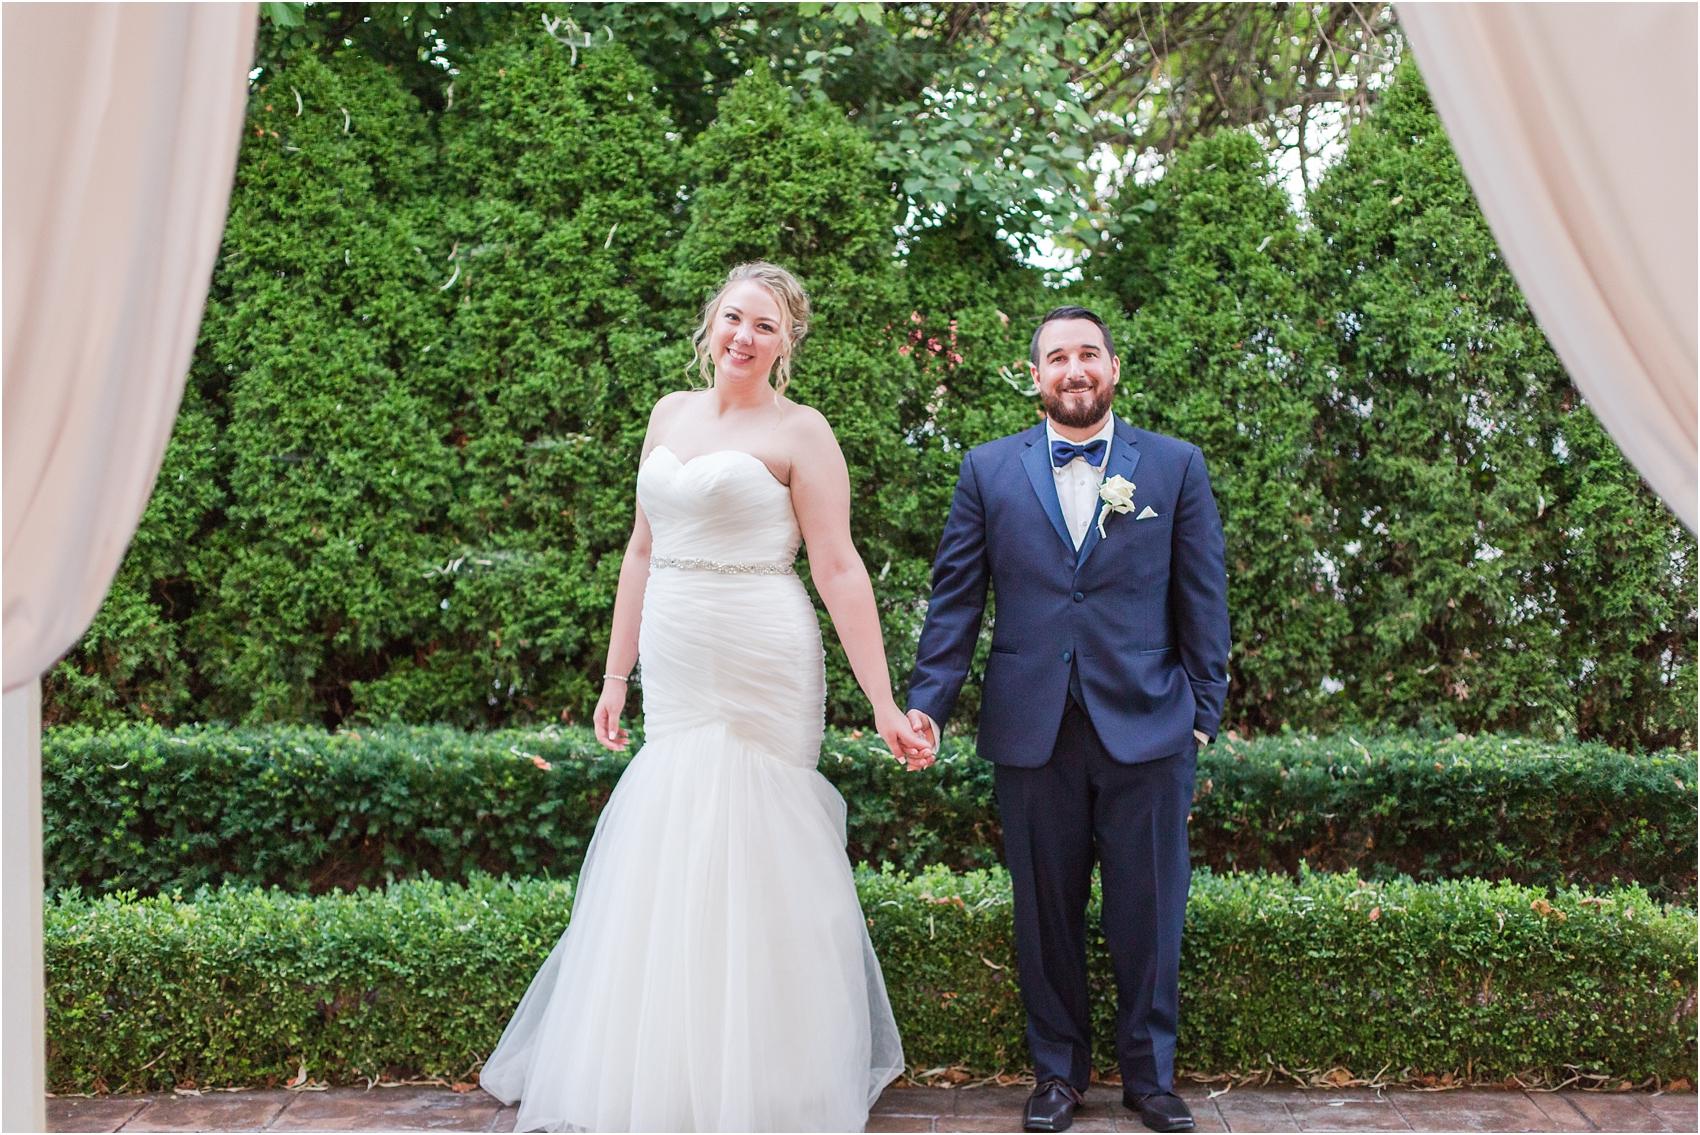 joyful-and-candid-navy-blush-wedding-photos-at-crystal-gardens-in-howell-mi-by-courtney-carolyn-photography_0104.jpg